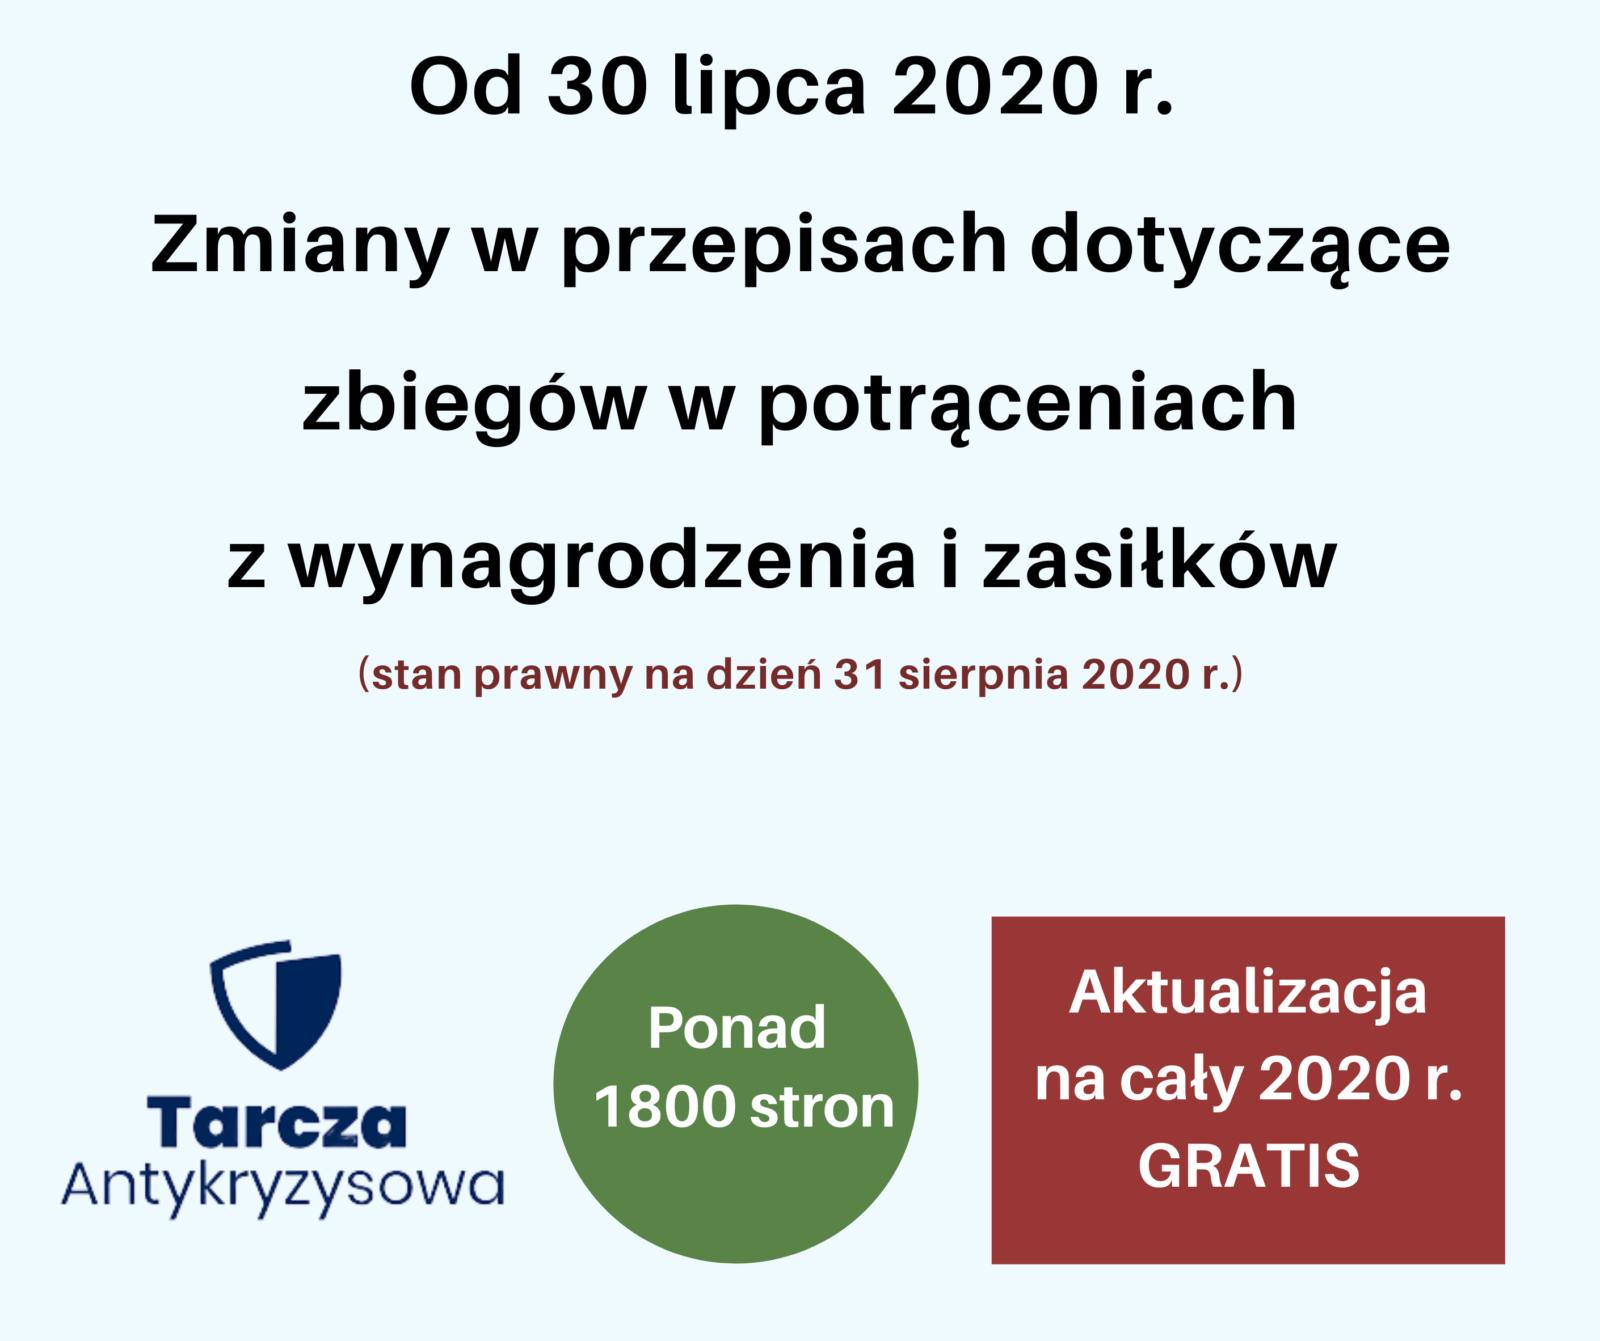 zmiany zbieg potracen od 30 lipca 2020